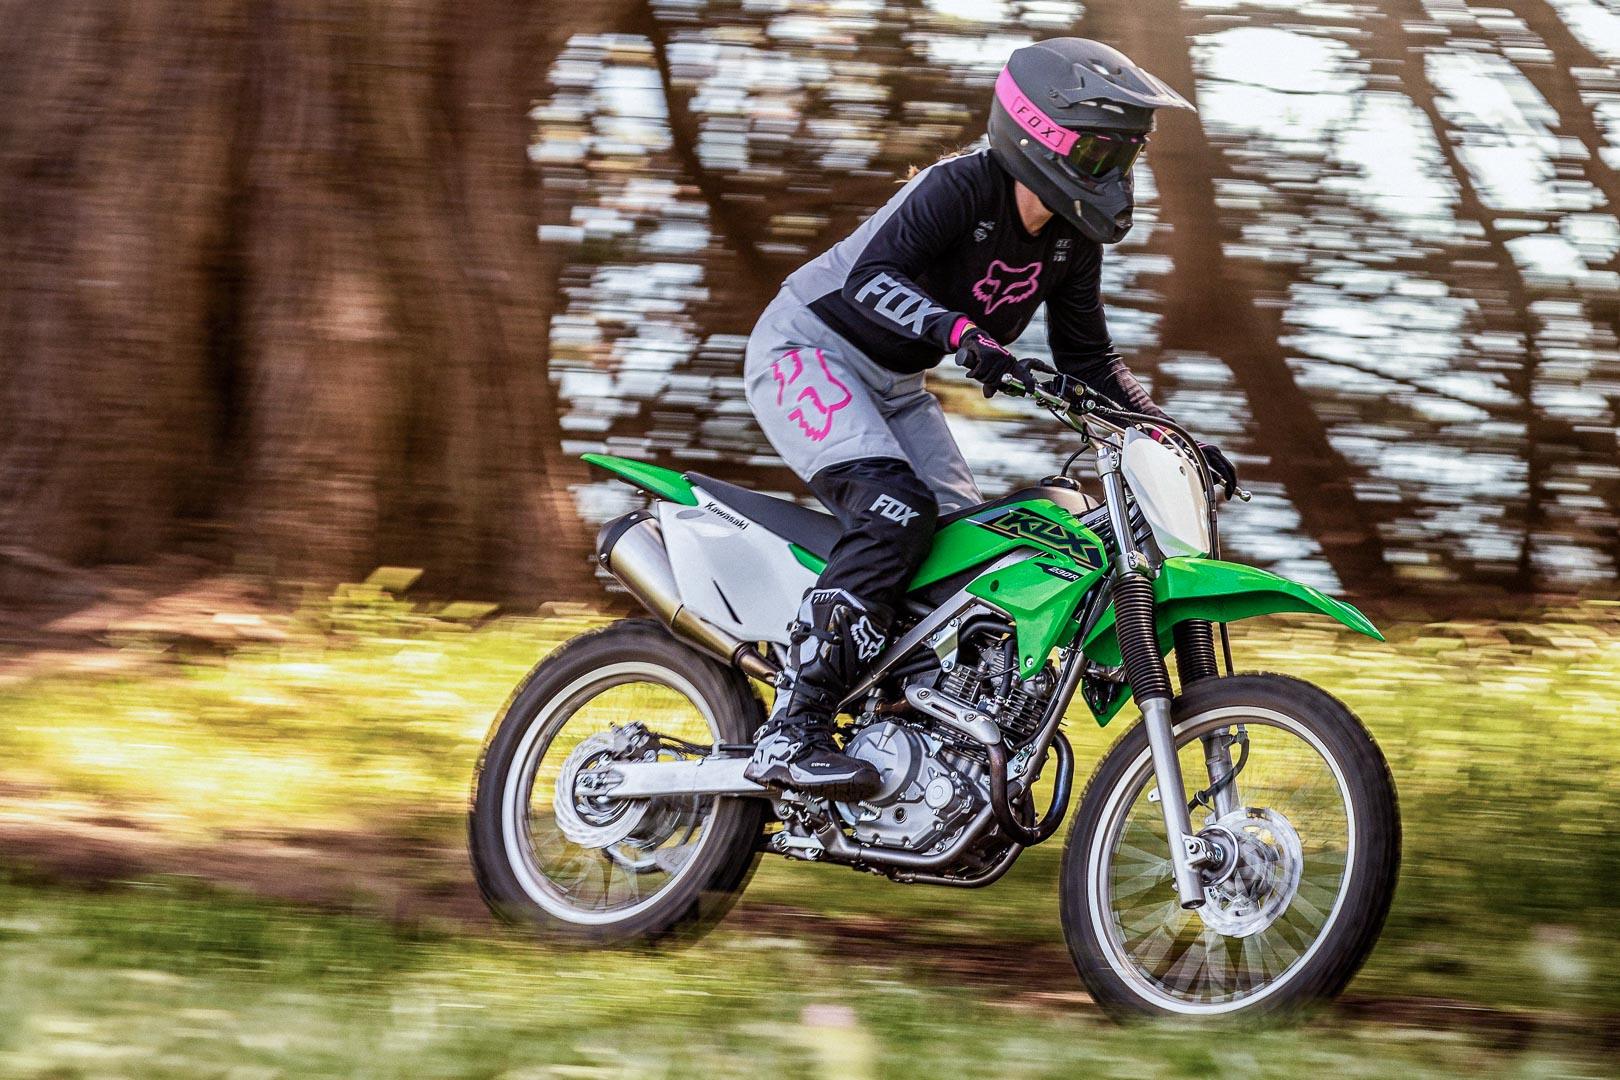 2021 Kawasaki KLX230R S First Look (8 Fast Facts)